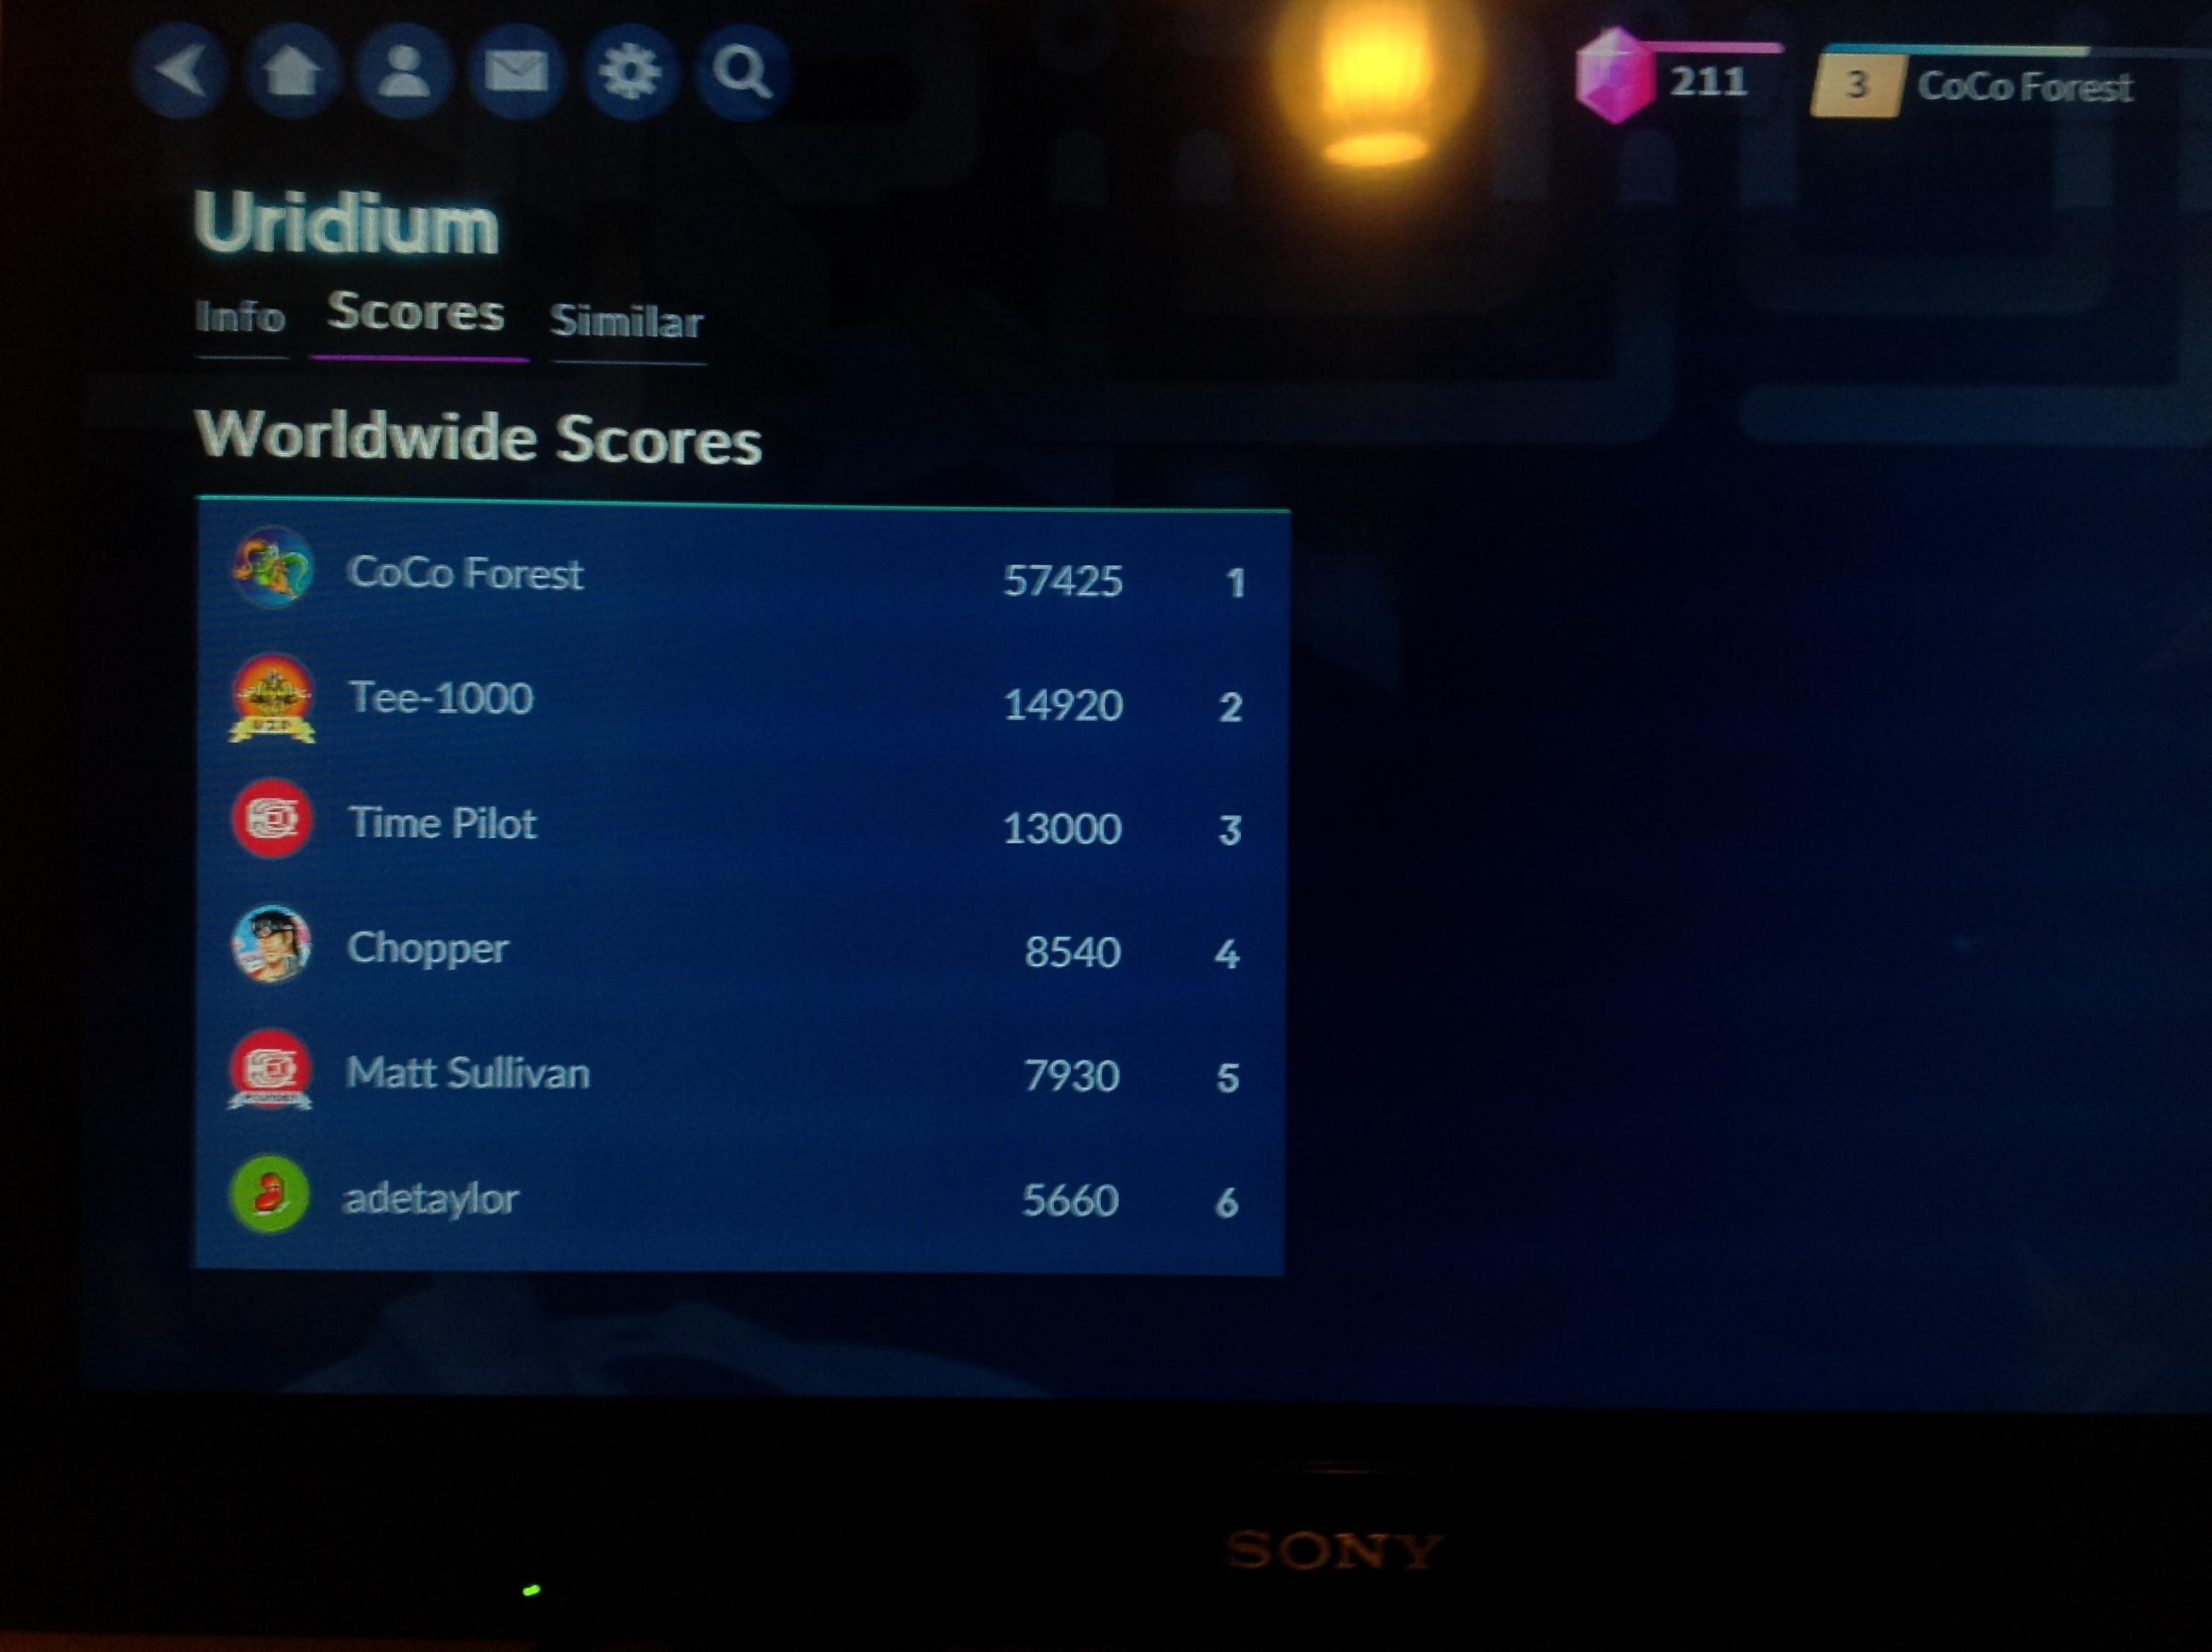 Uridium 57,425 points